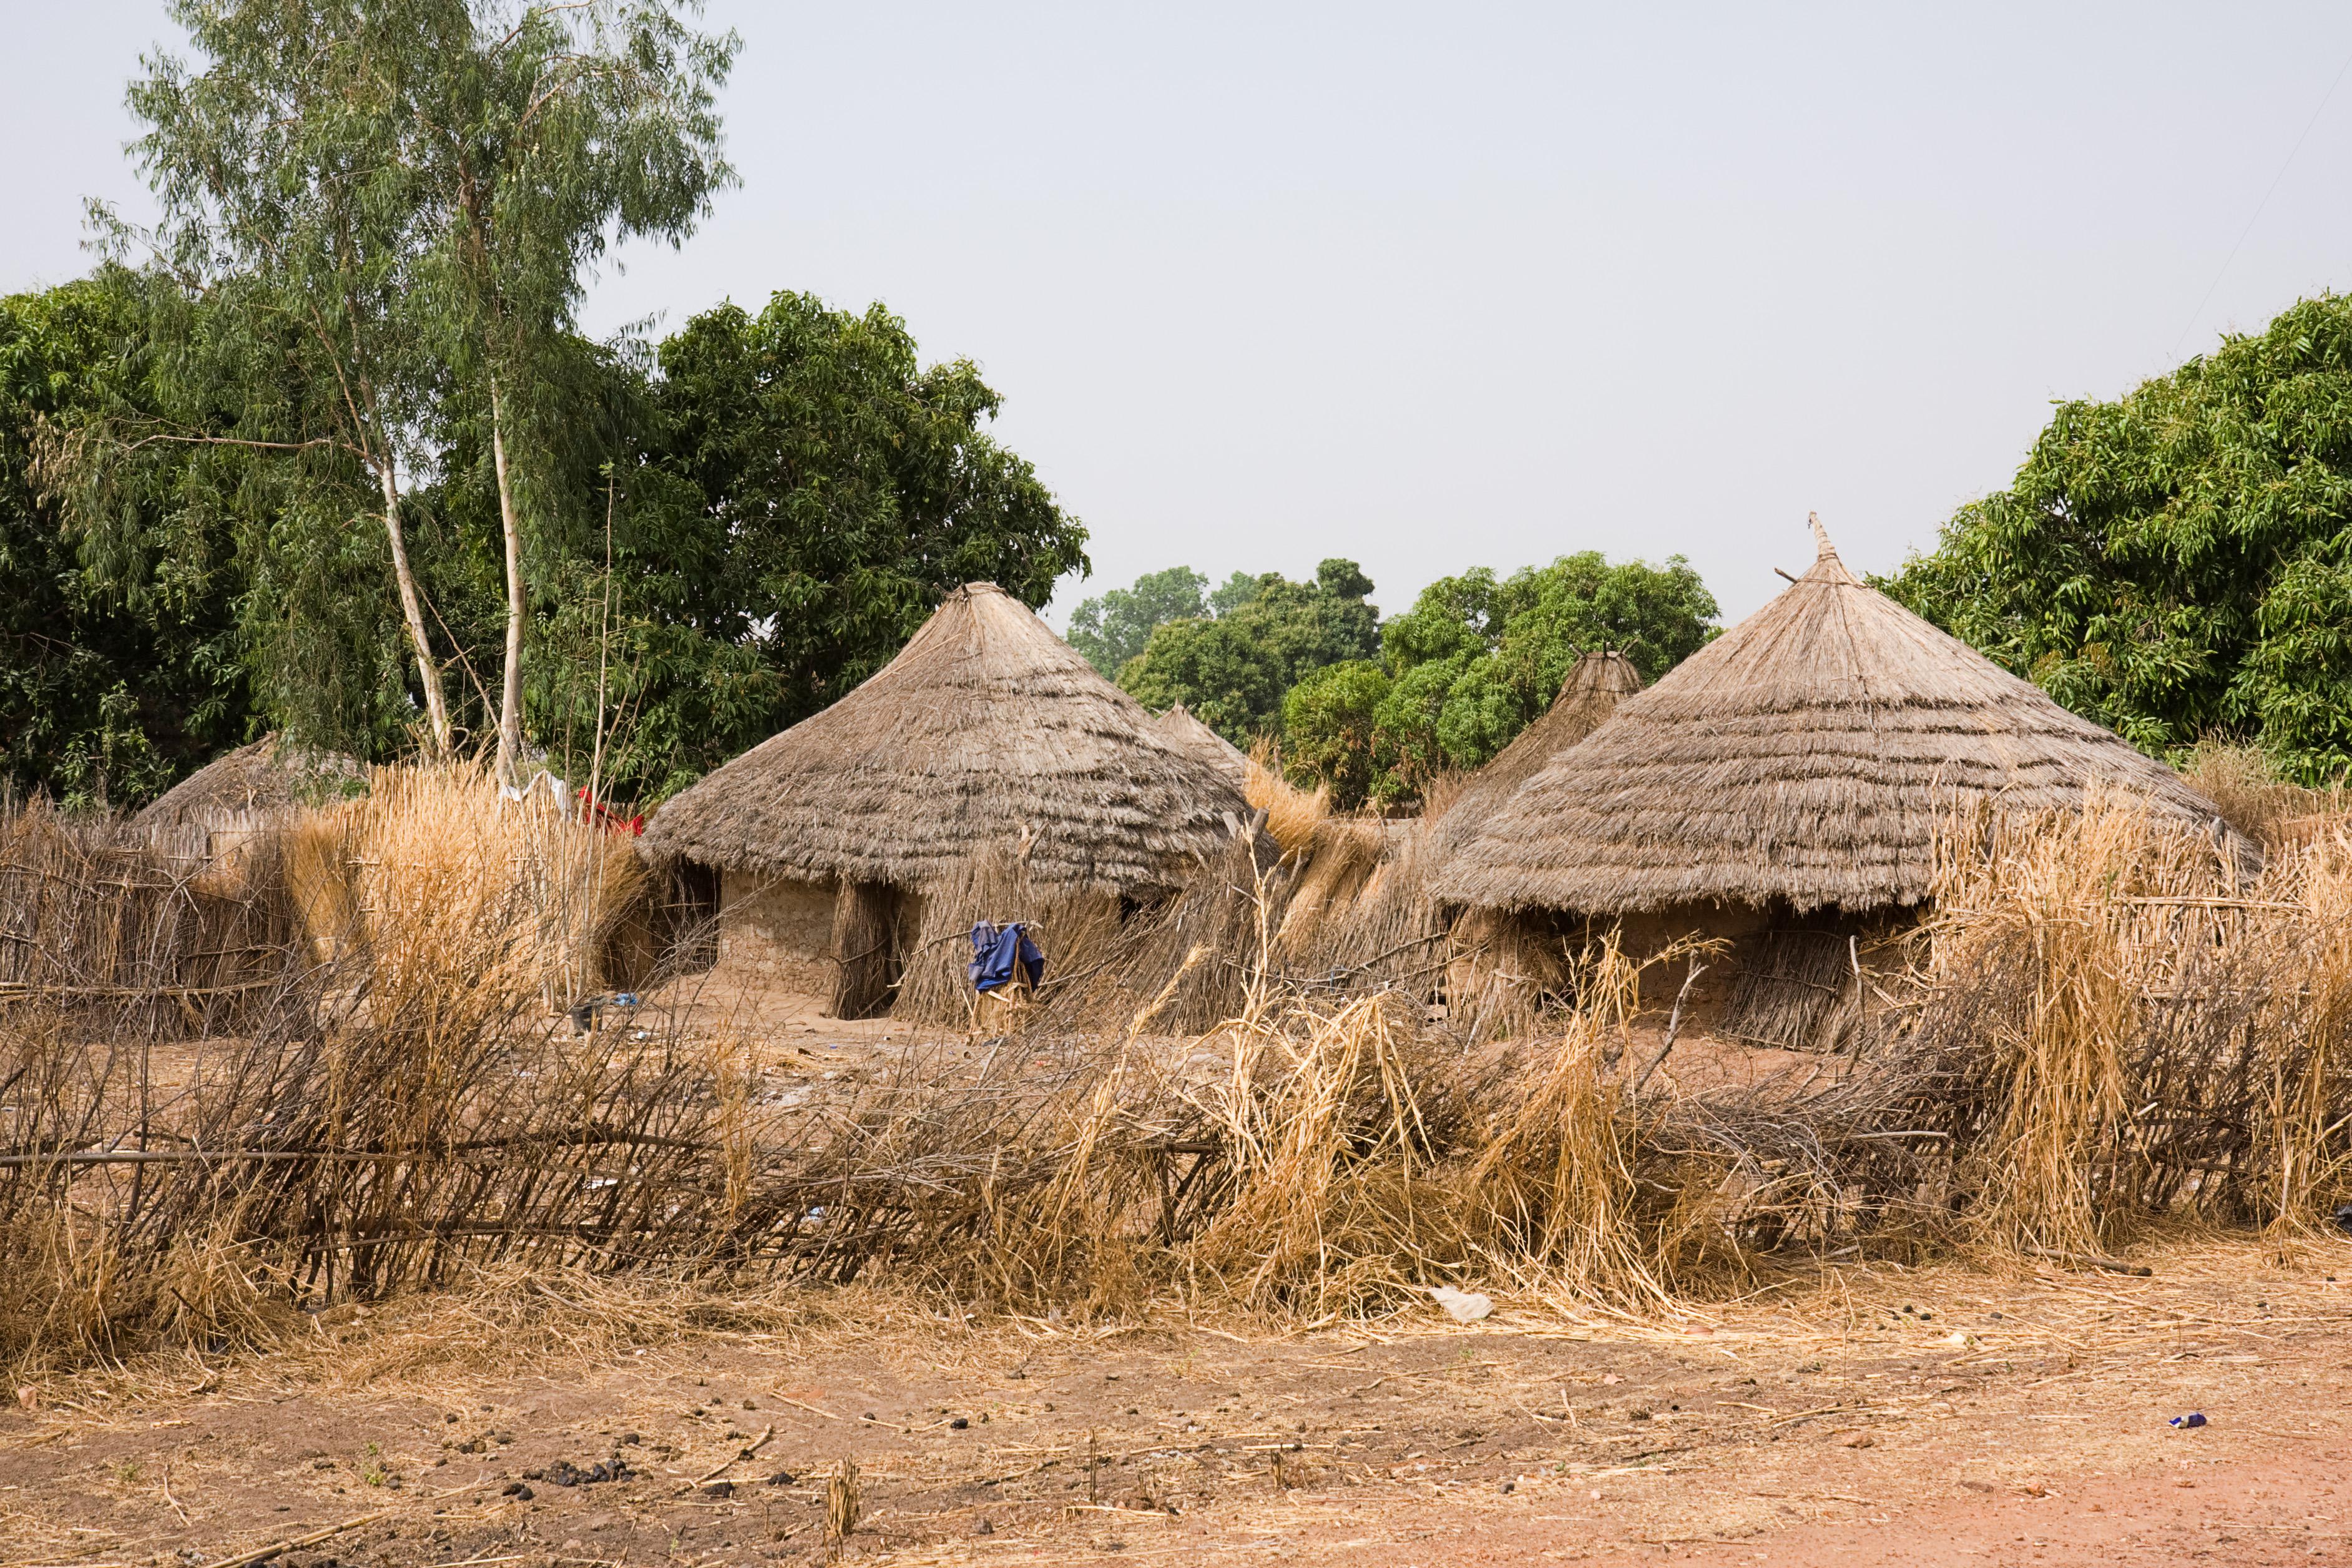 File:Gambian village.jpg - Wikimedia Commons